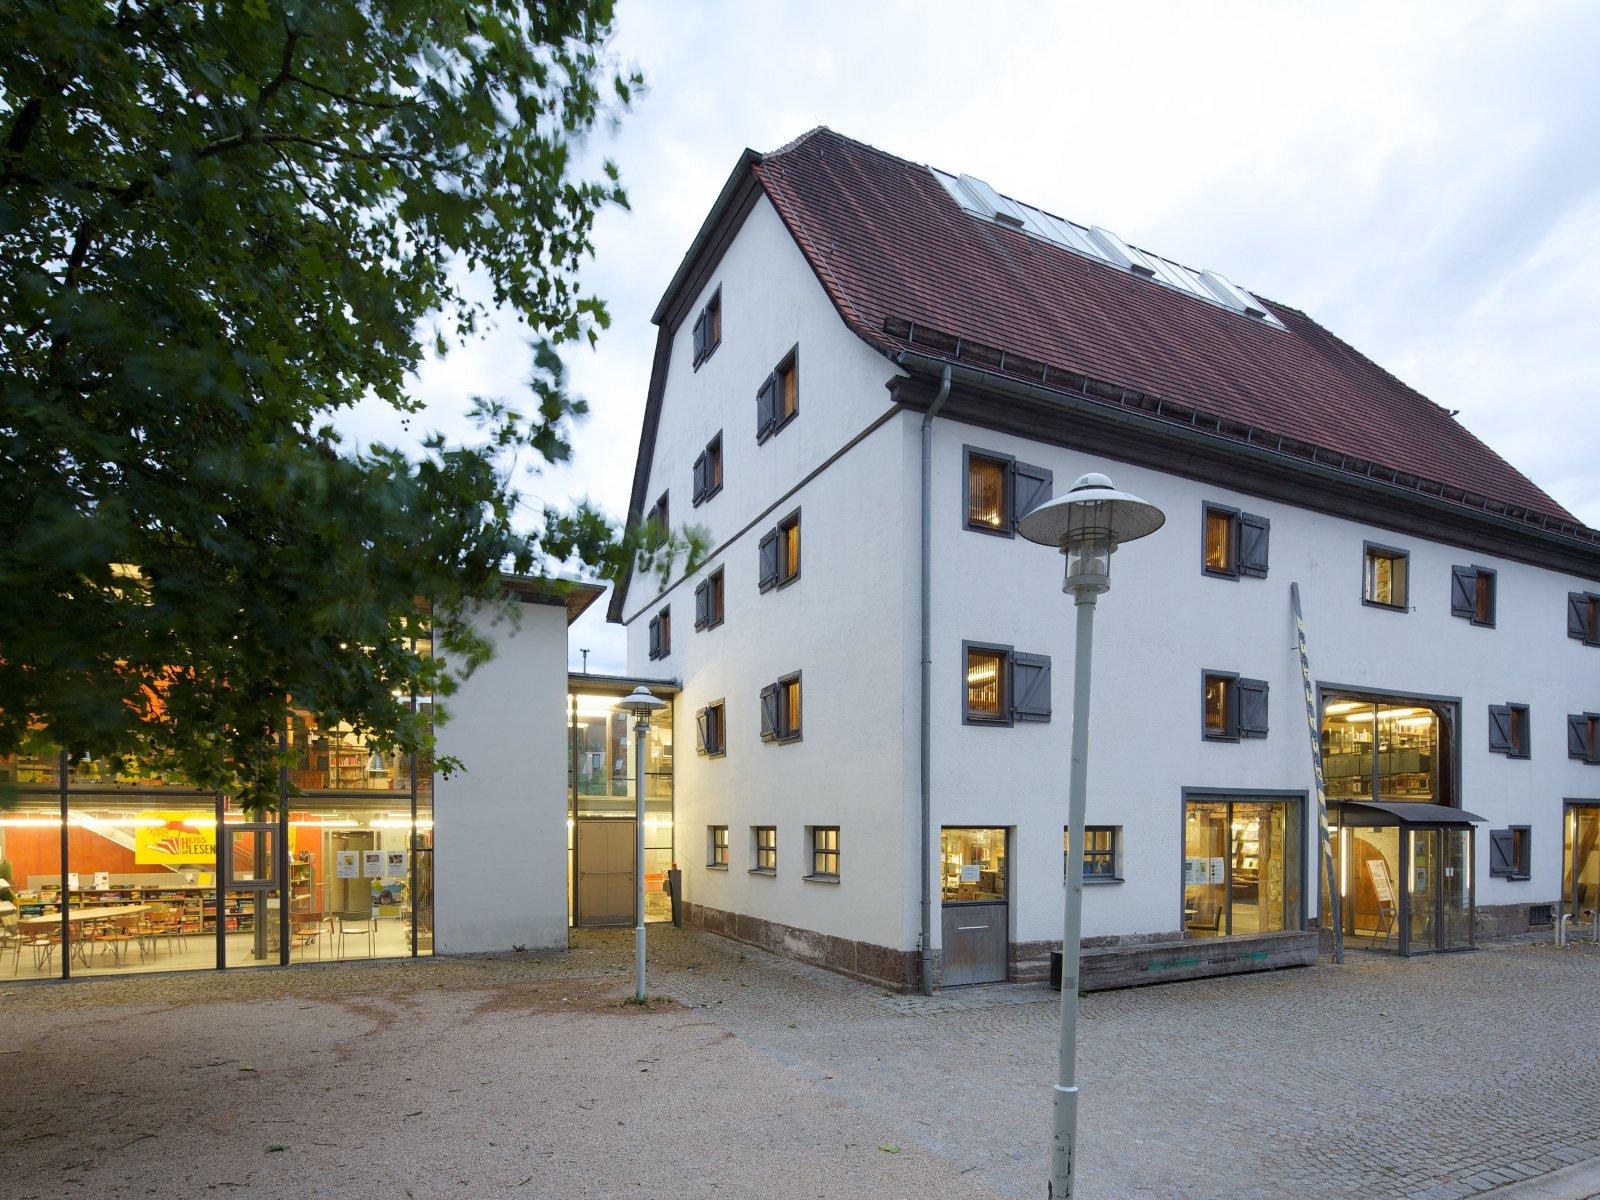 Stadtbilbiothek im Kulturzentrum Hofscheuer